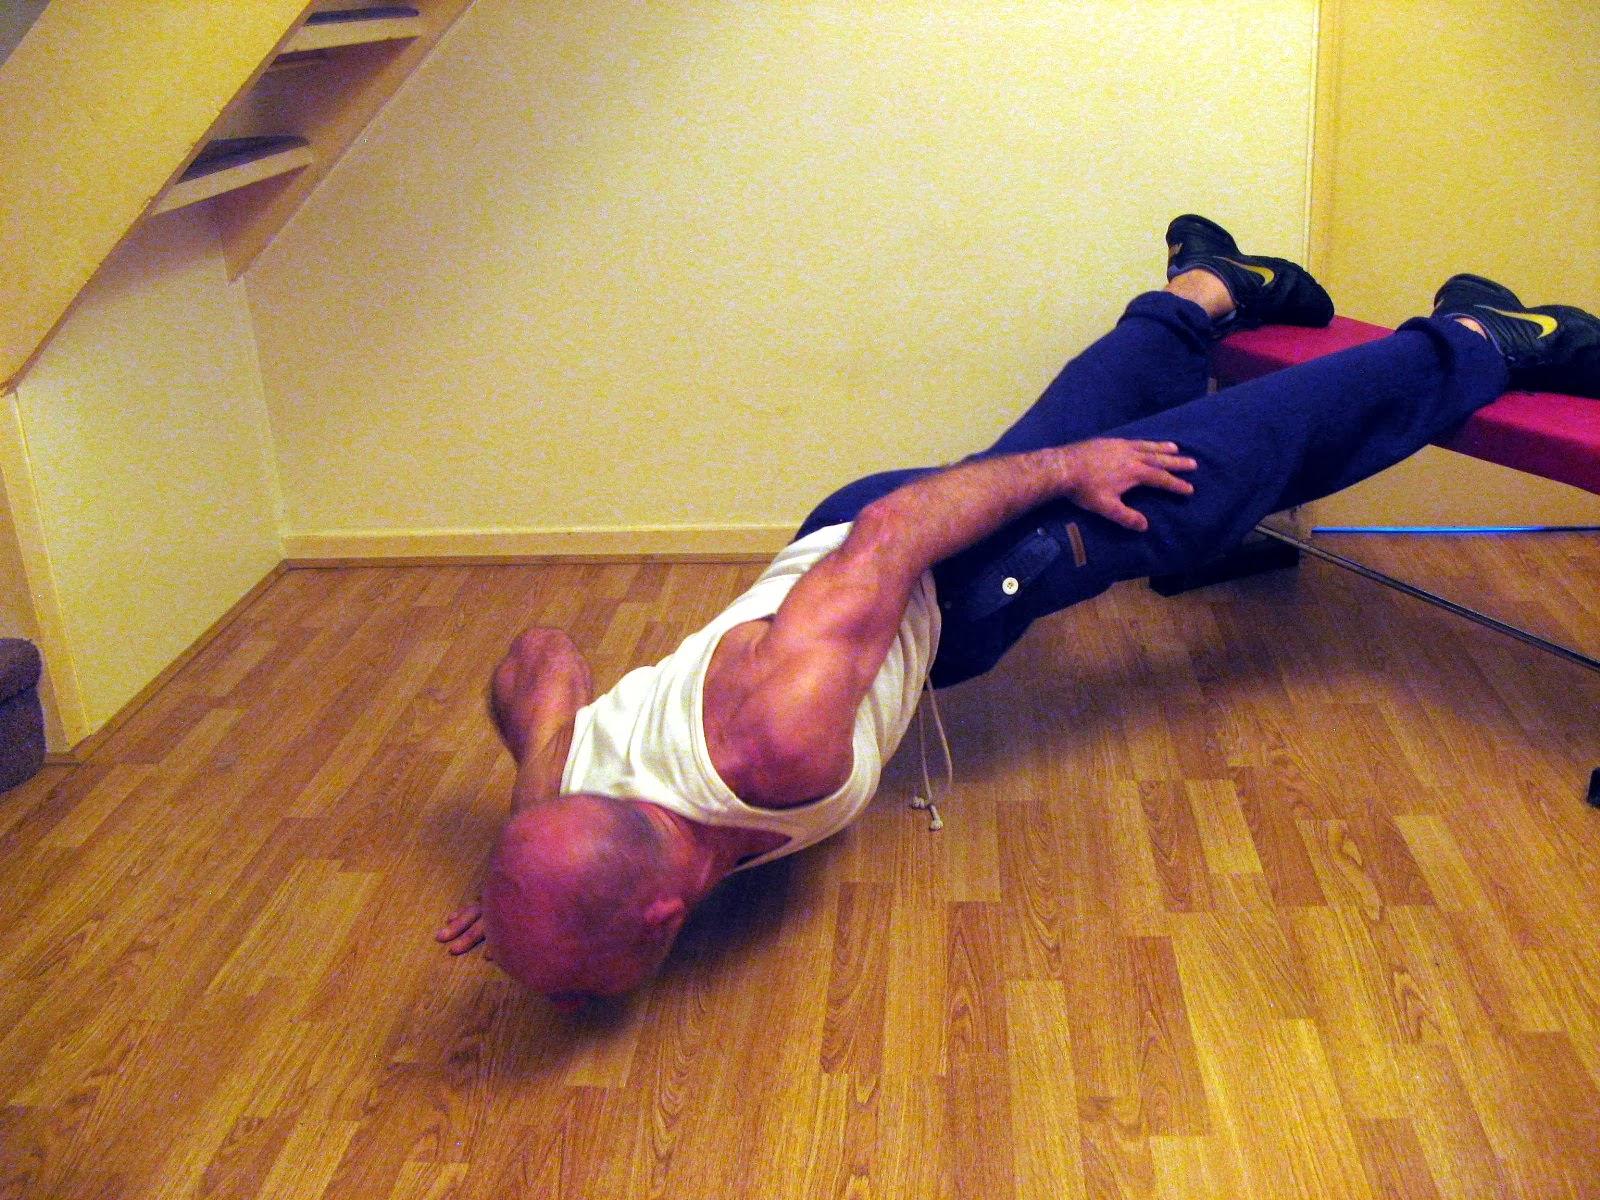 Start Bodyweight Training: Push up progression